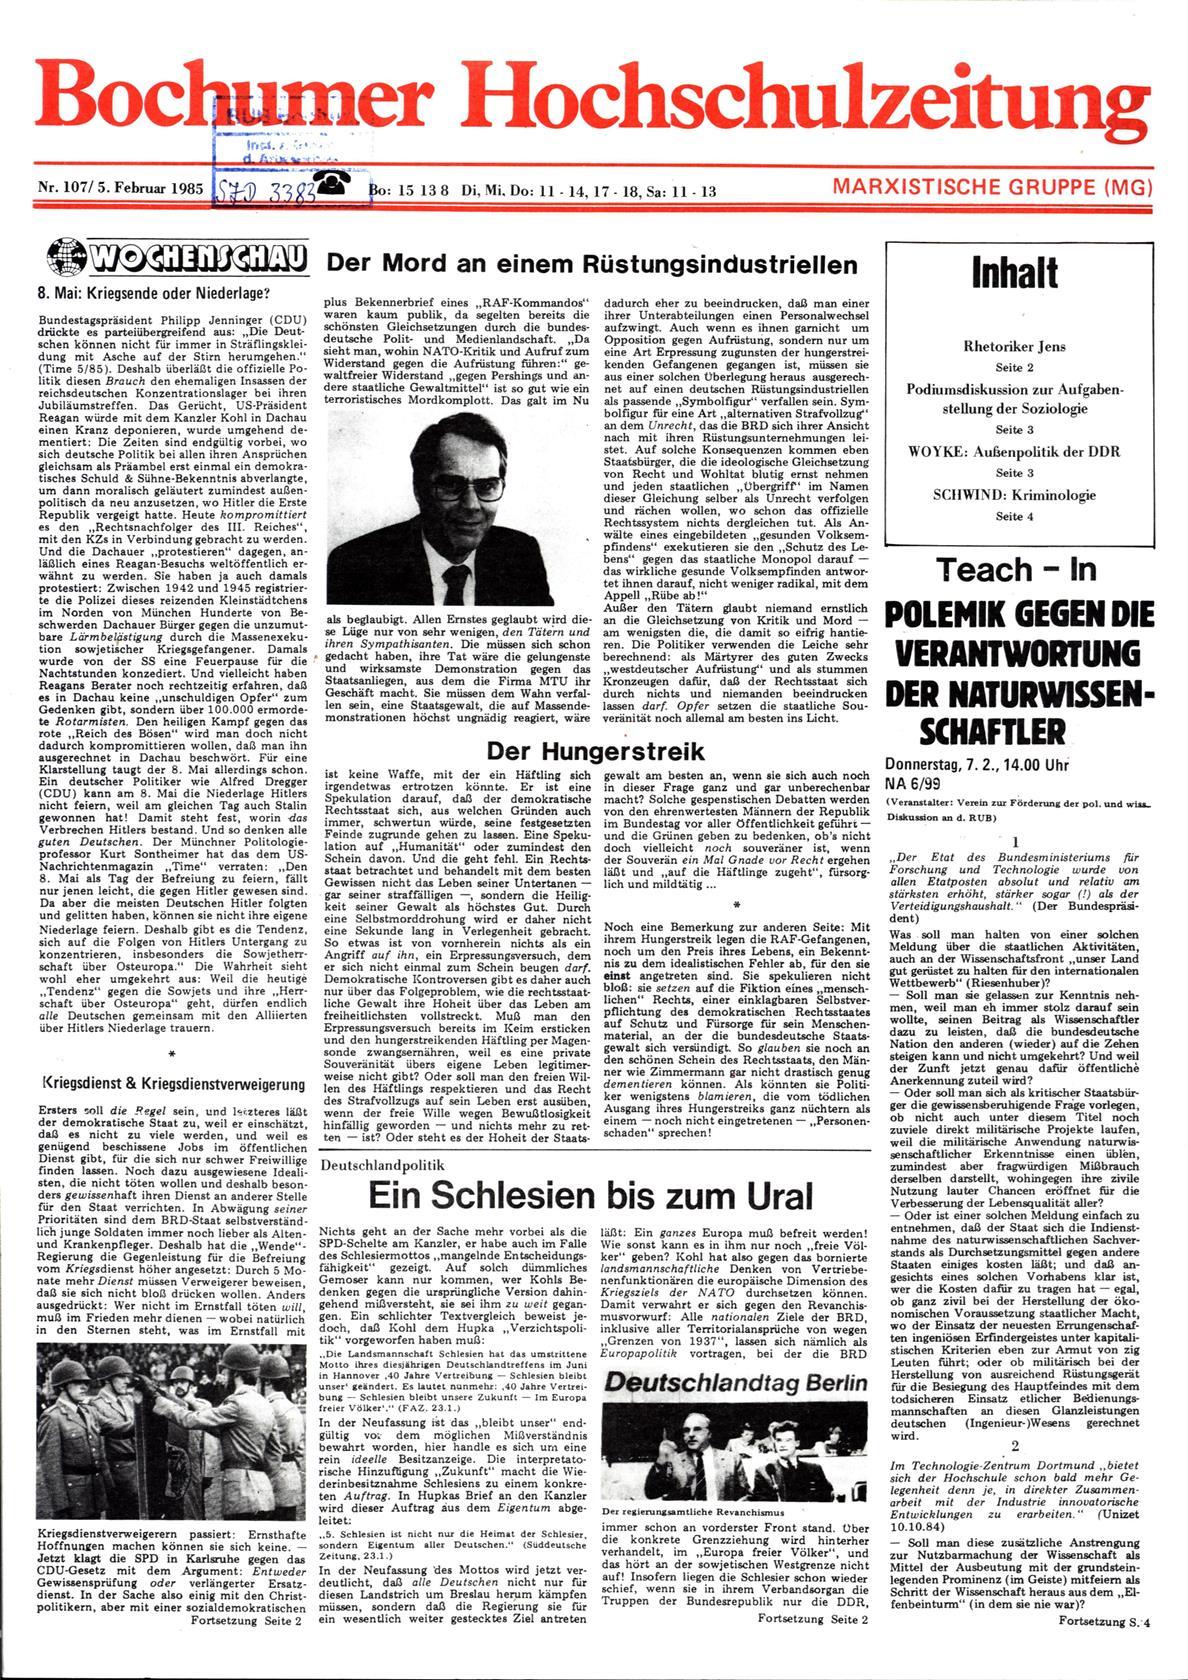 Bochum_BHZ_19850205_107_001